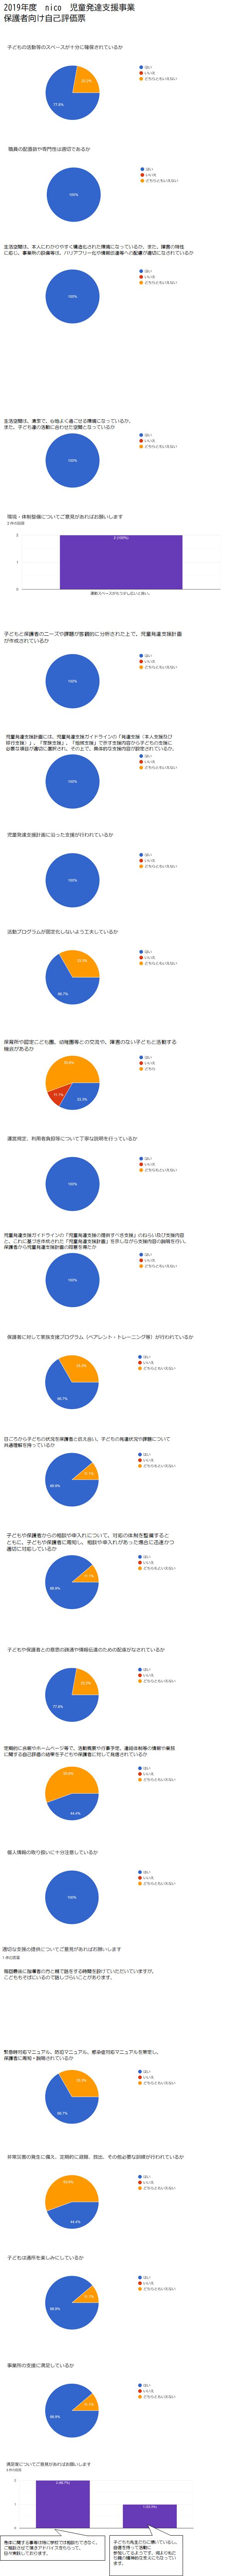 2019nico児発 保護者向け自己評価集計結果